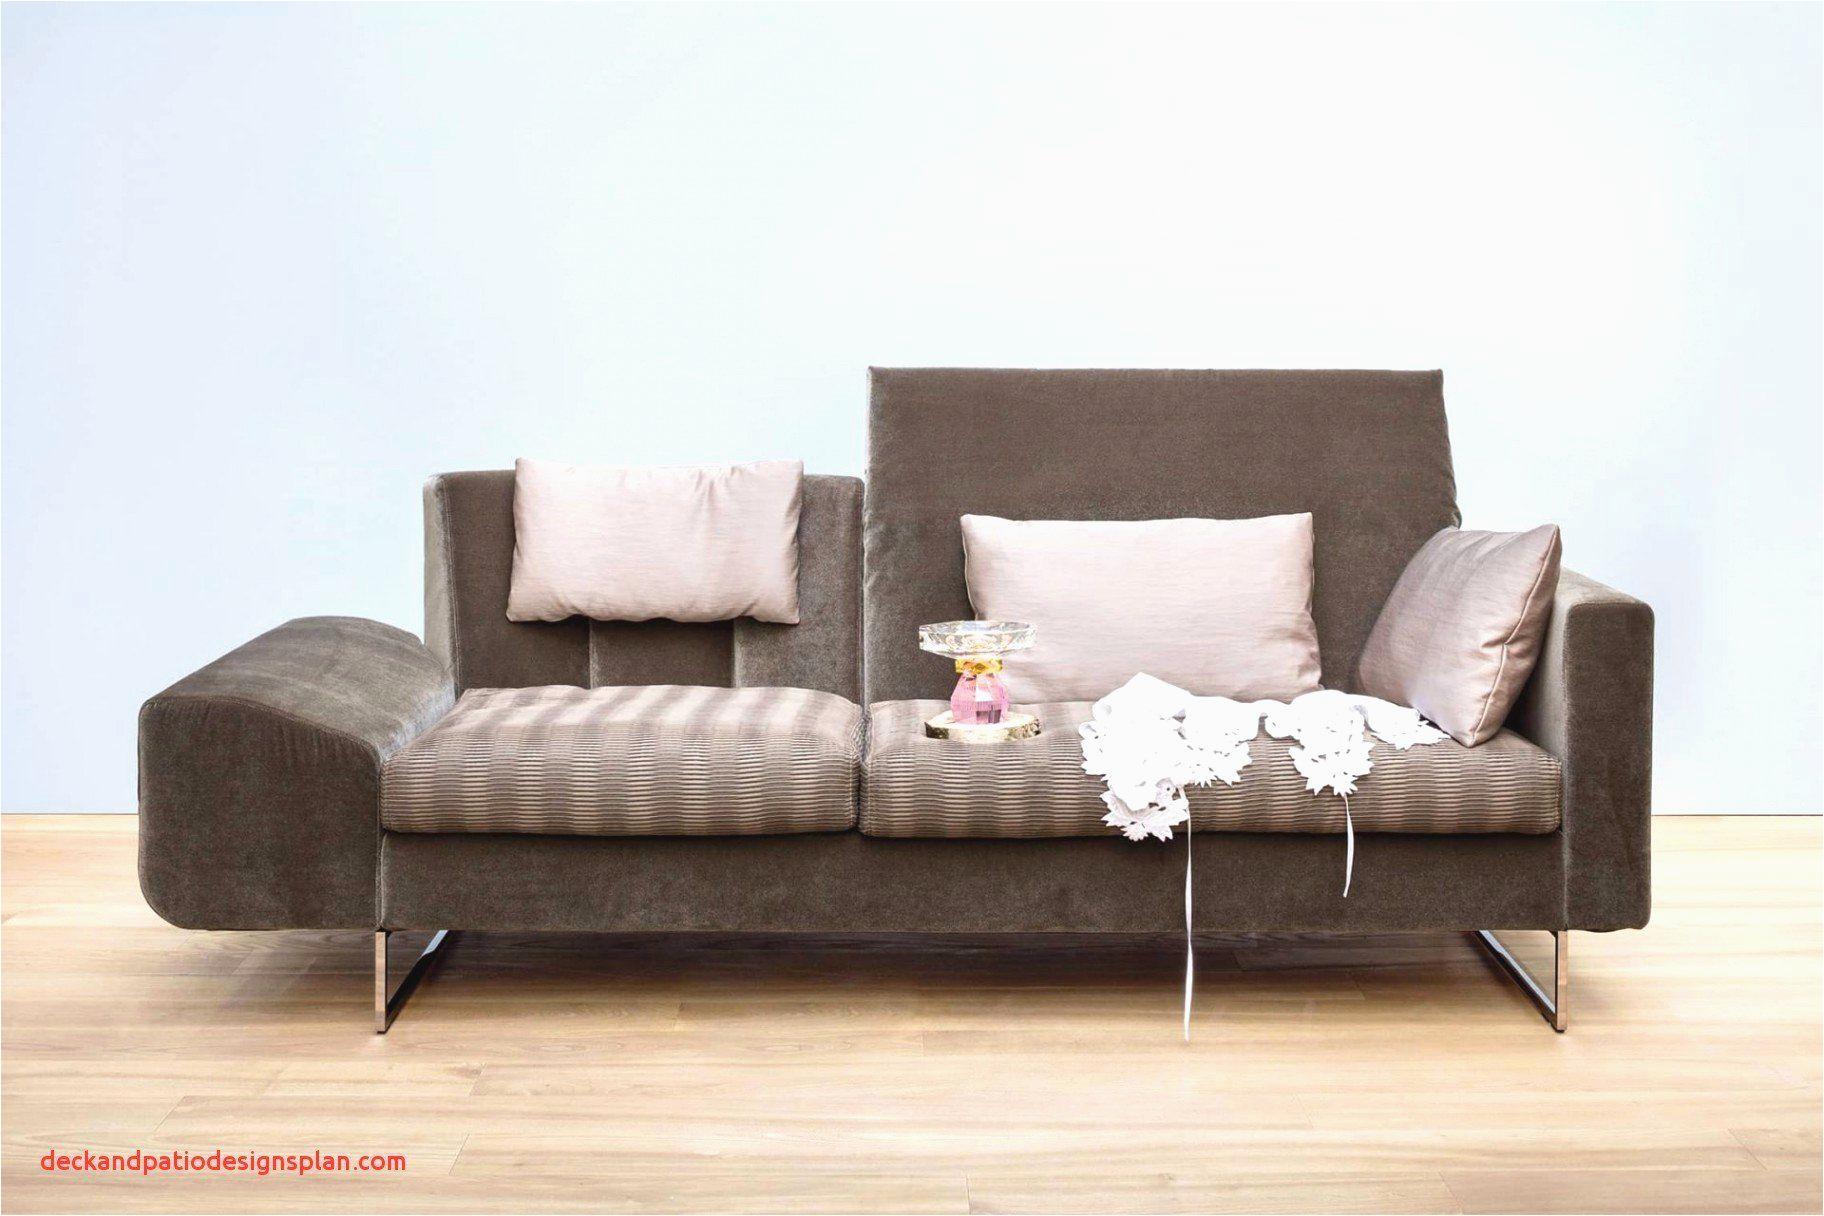 stuhl neu beziehen fantastisch 20 sessel neu polstern ideen luxus